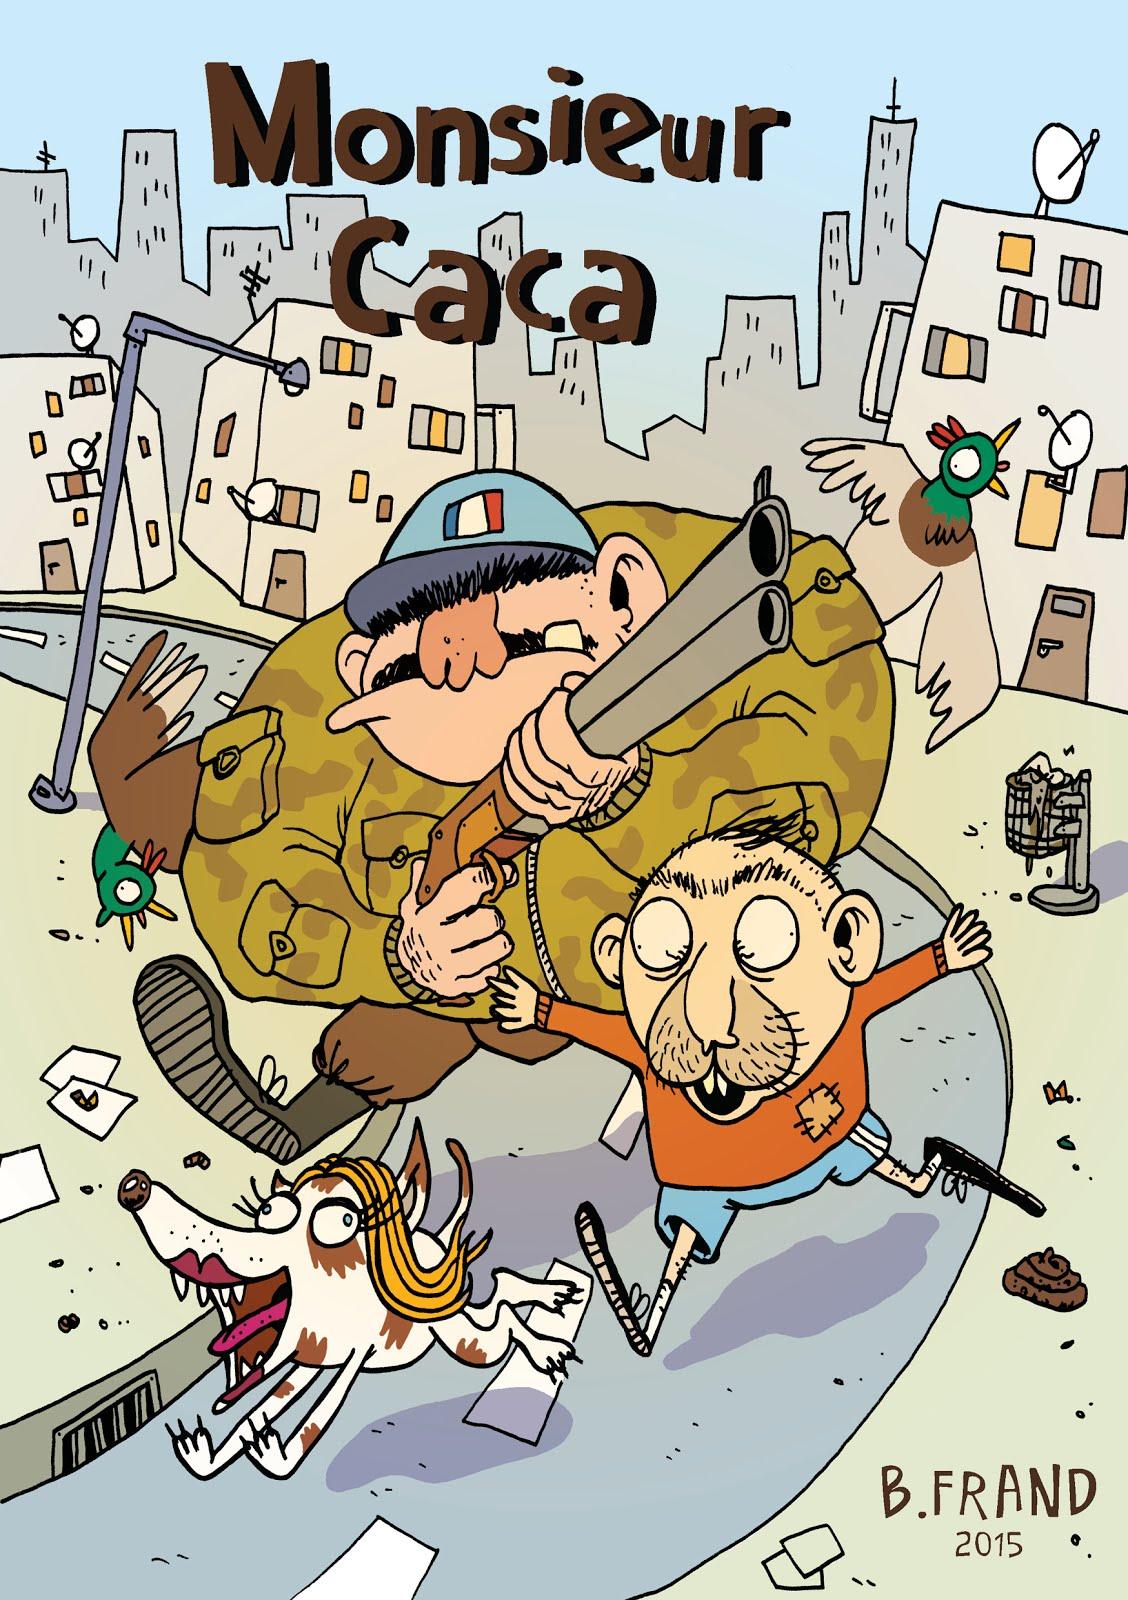 Monsieur Caca - dispo